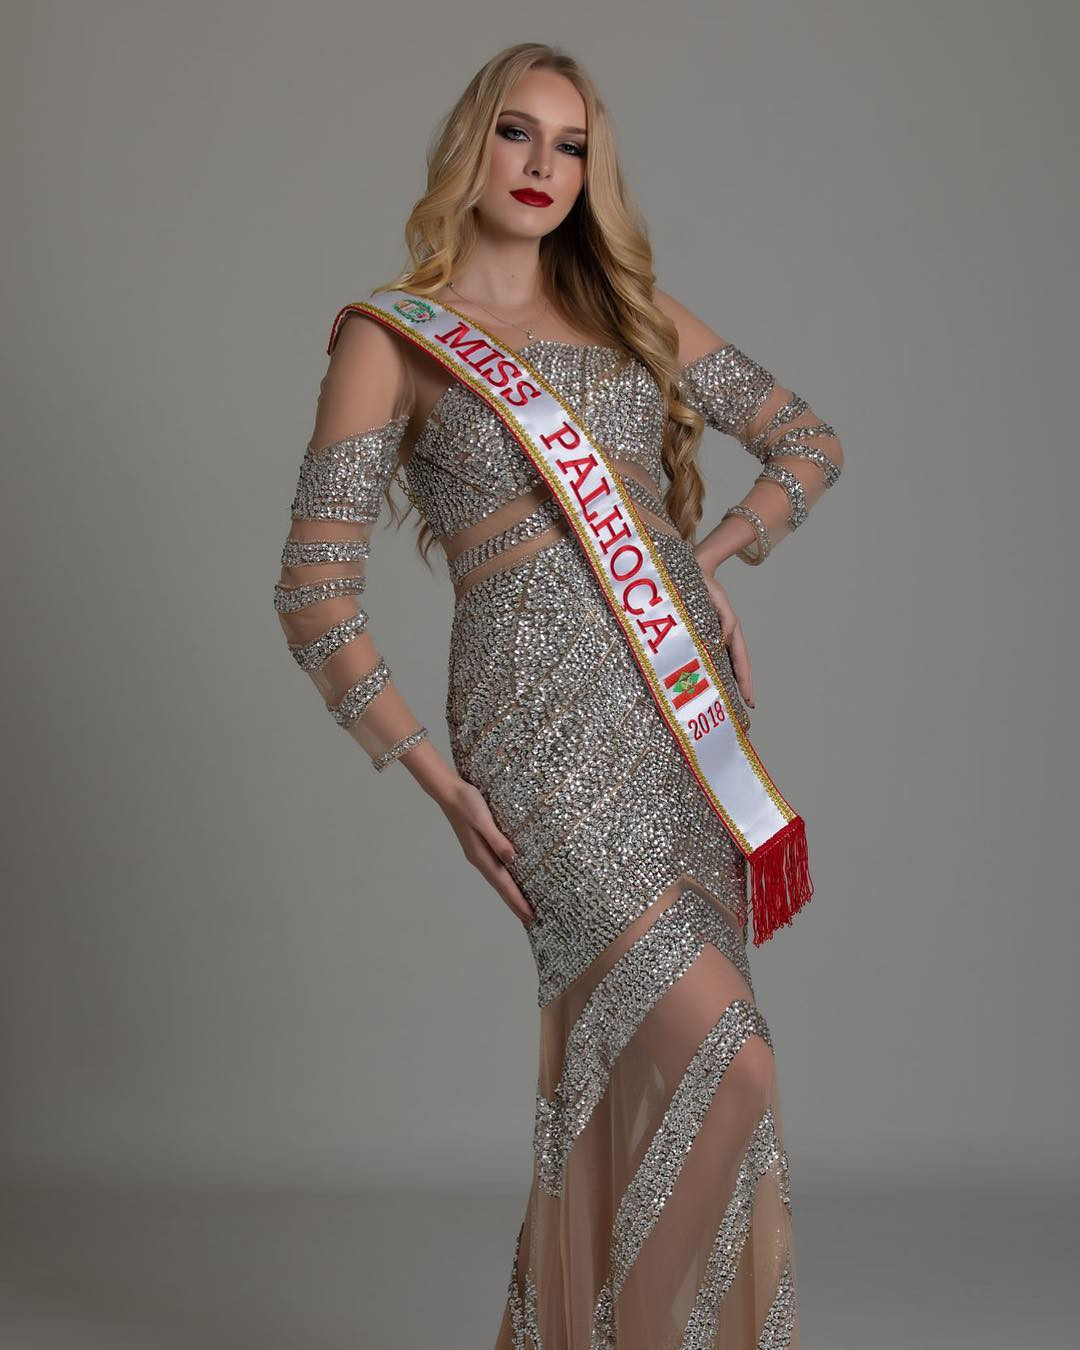 elizama aguilar, top 5 de miss brasil mundo 2019. - Página 5 Bd3xig10